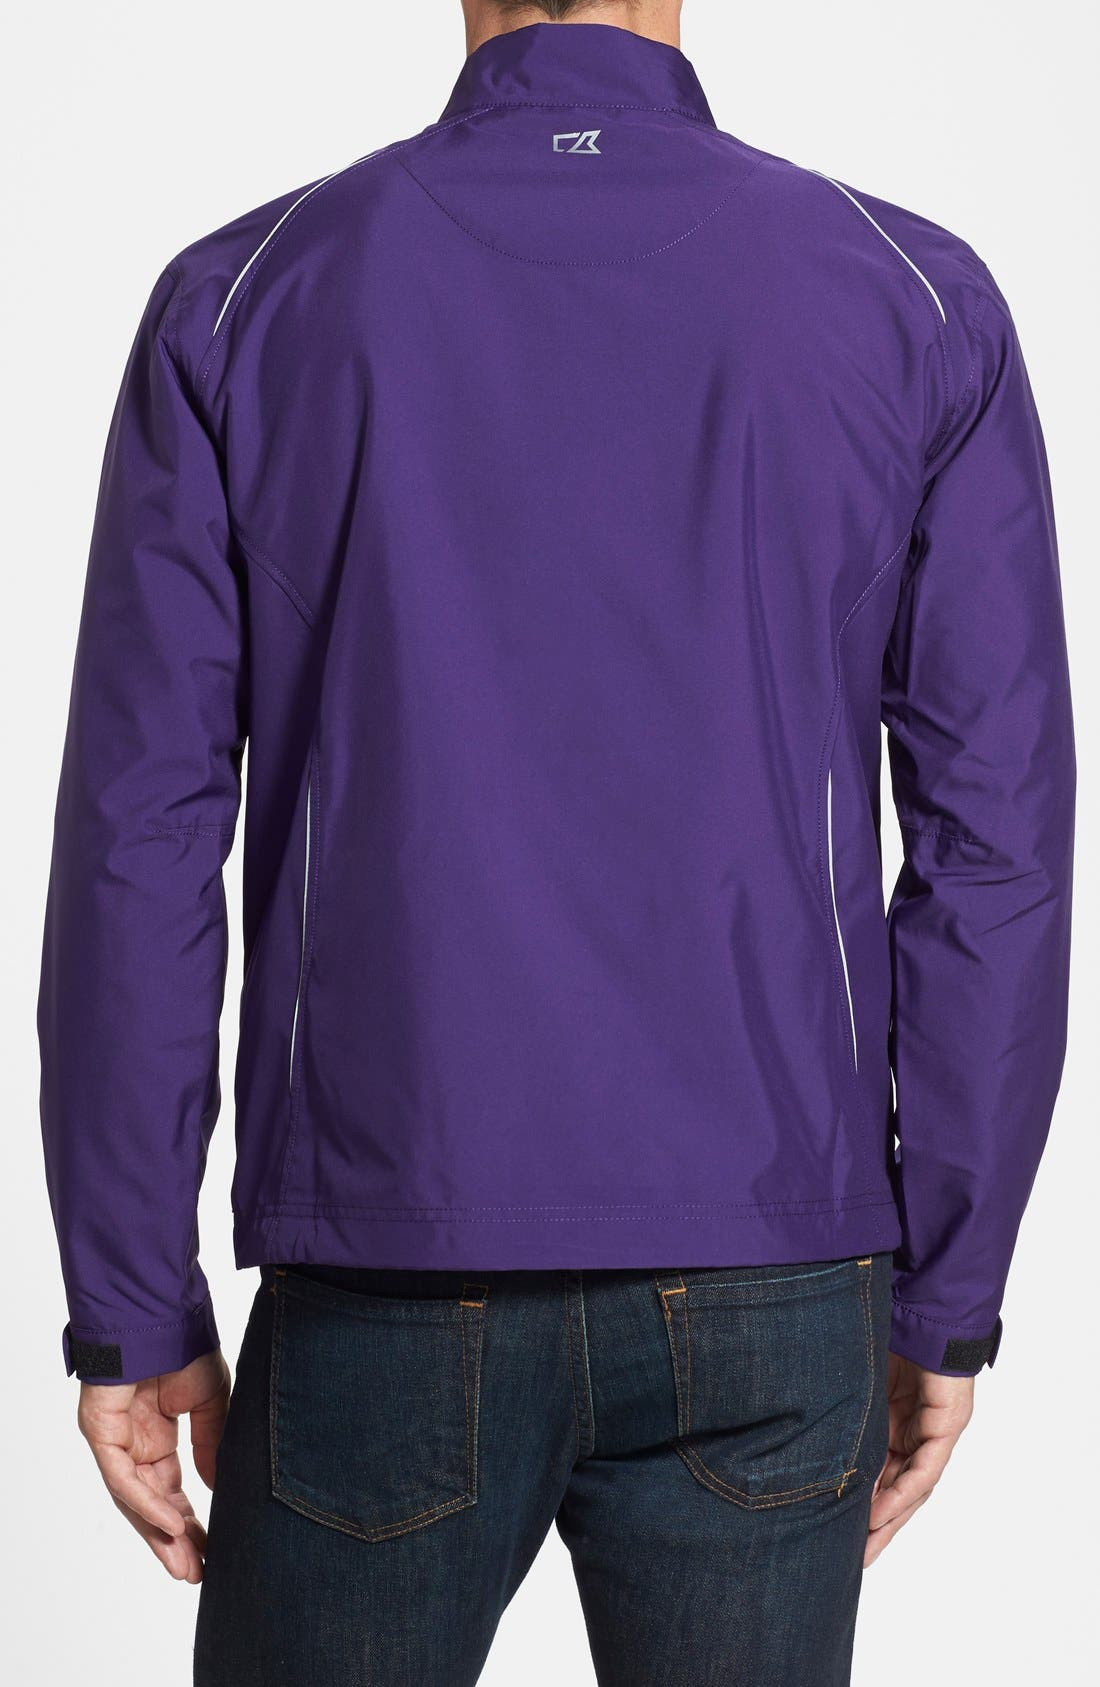 Alternate Image 2  - Cutter & Buck 'Beacon' WeatherTec Wind & Water Resistant Jacket